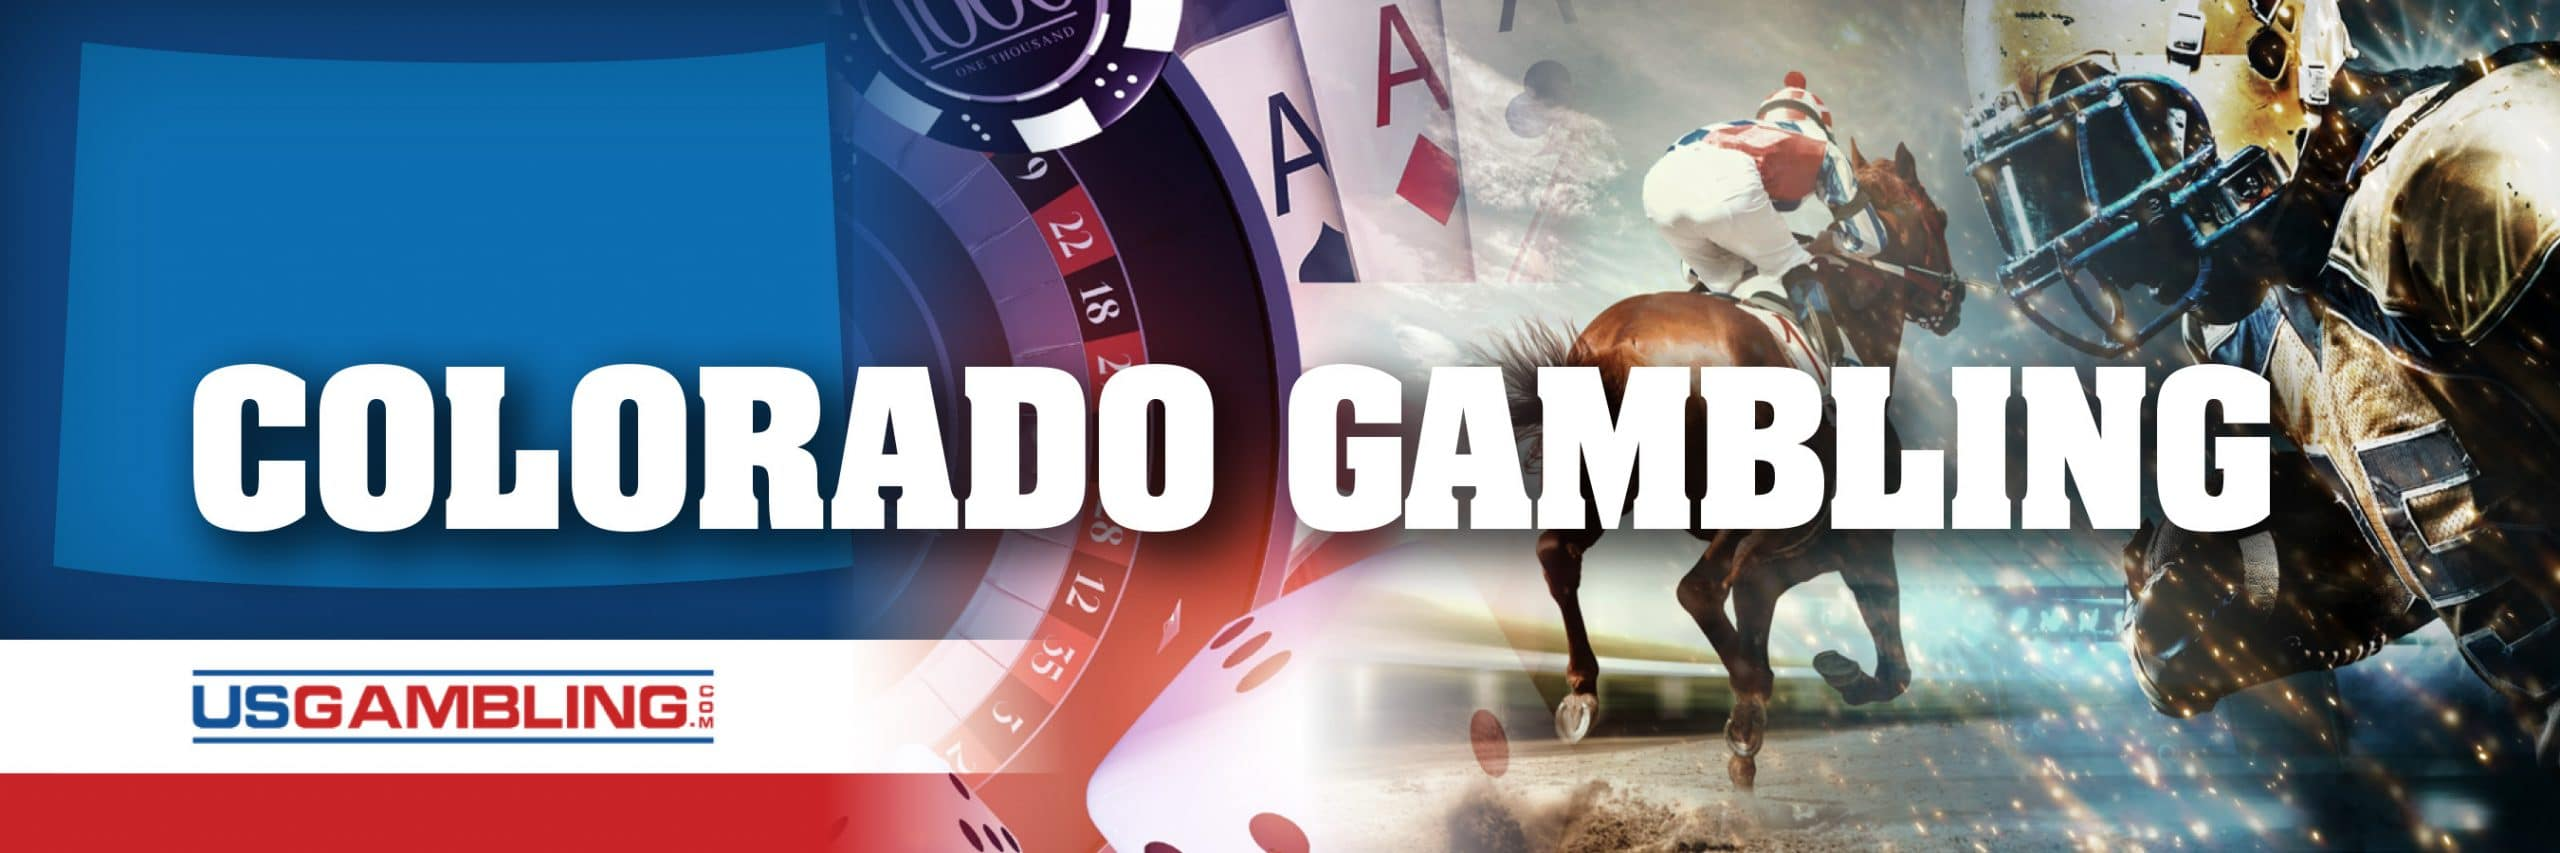 Legal Colorado Gambling